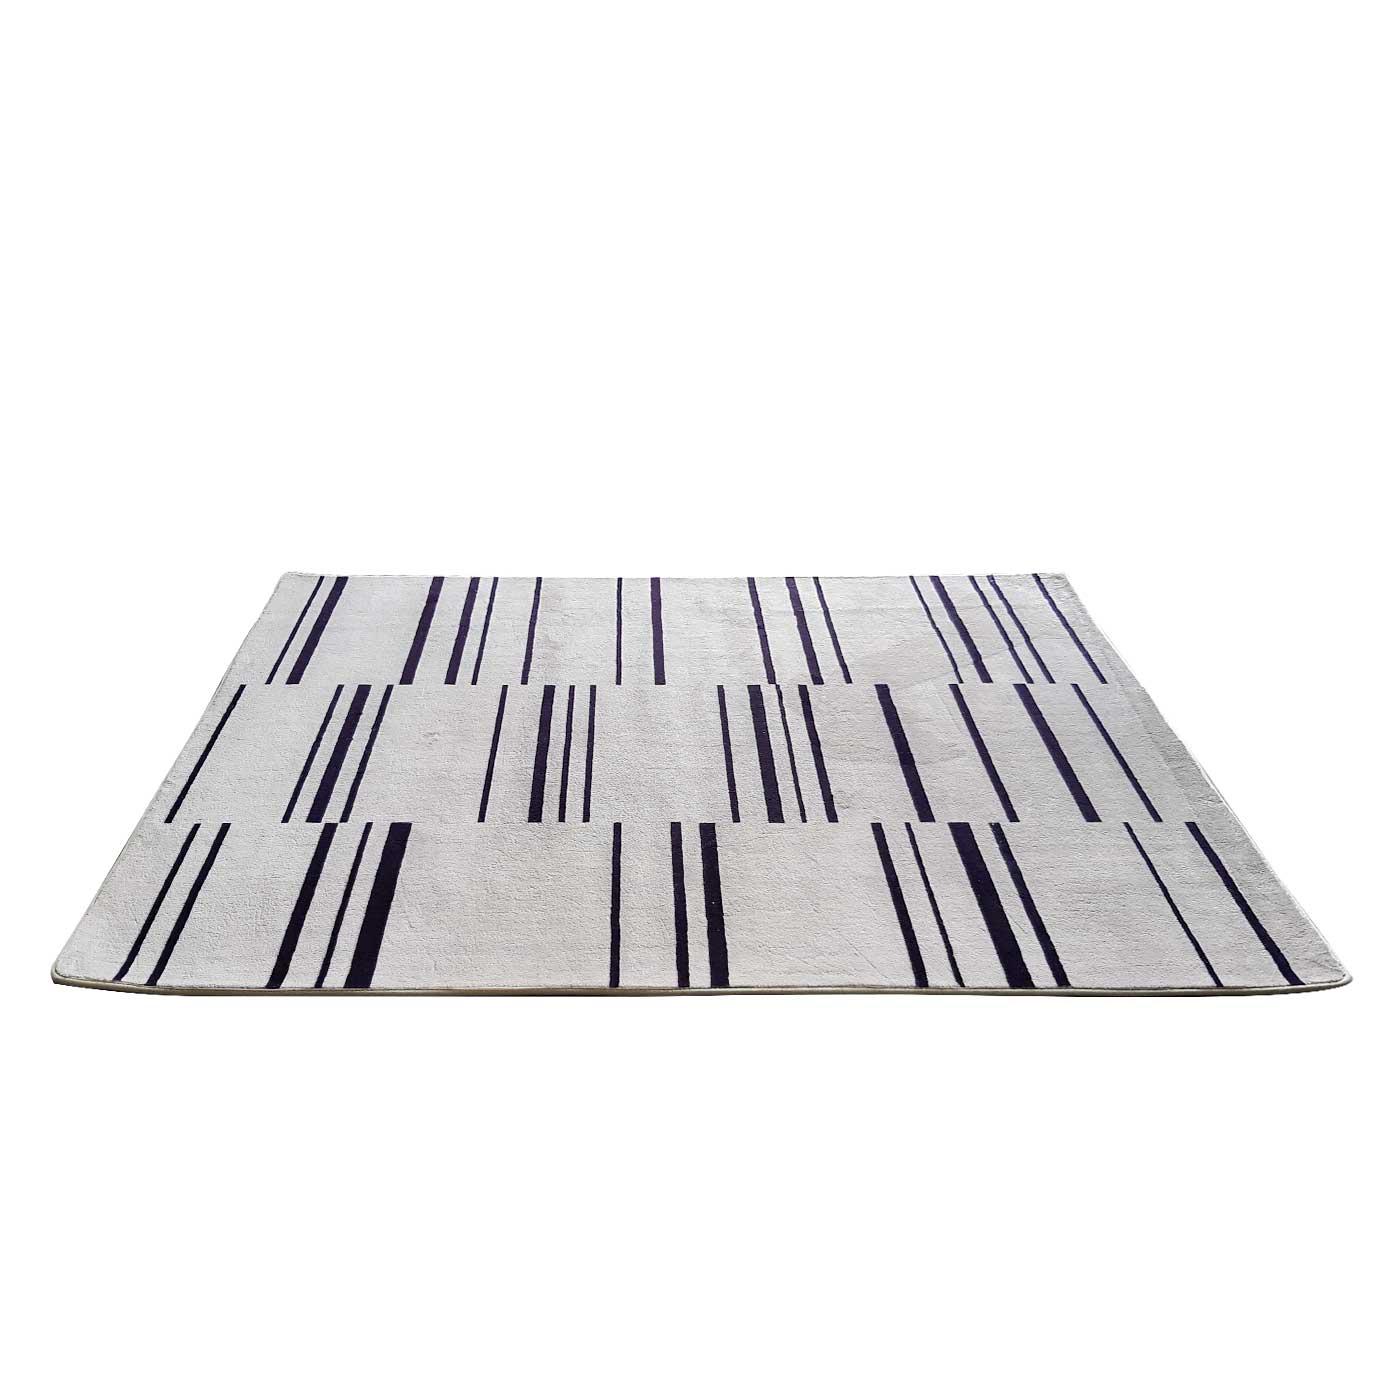 Linear Printed Monochrome Rug